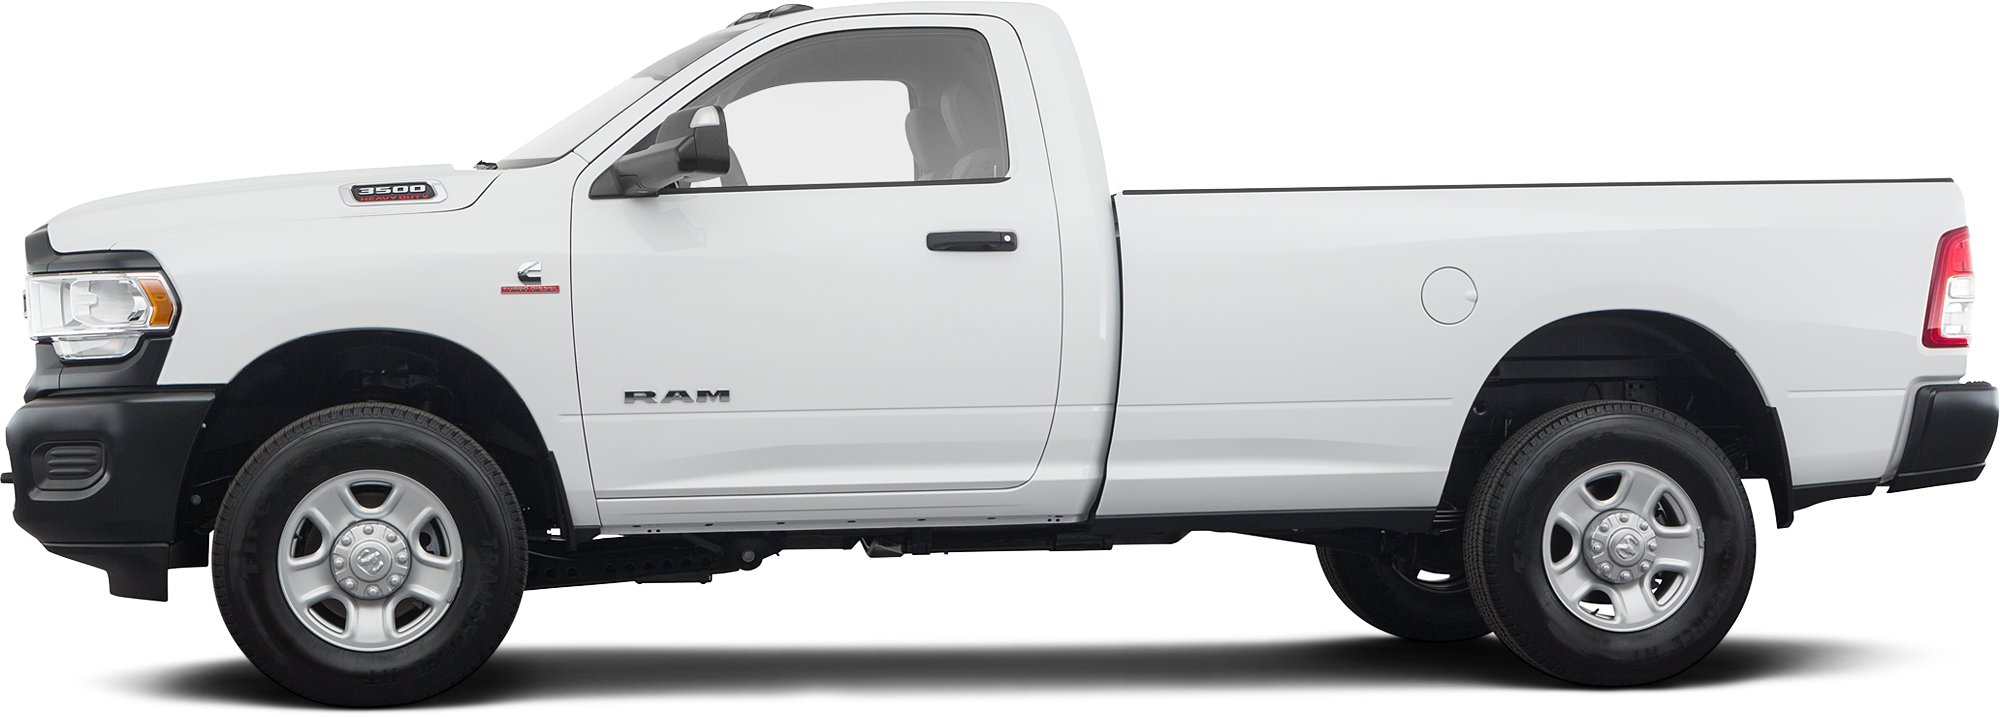 2021 Ram 3500 Truck Tradesman